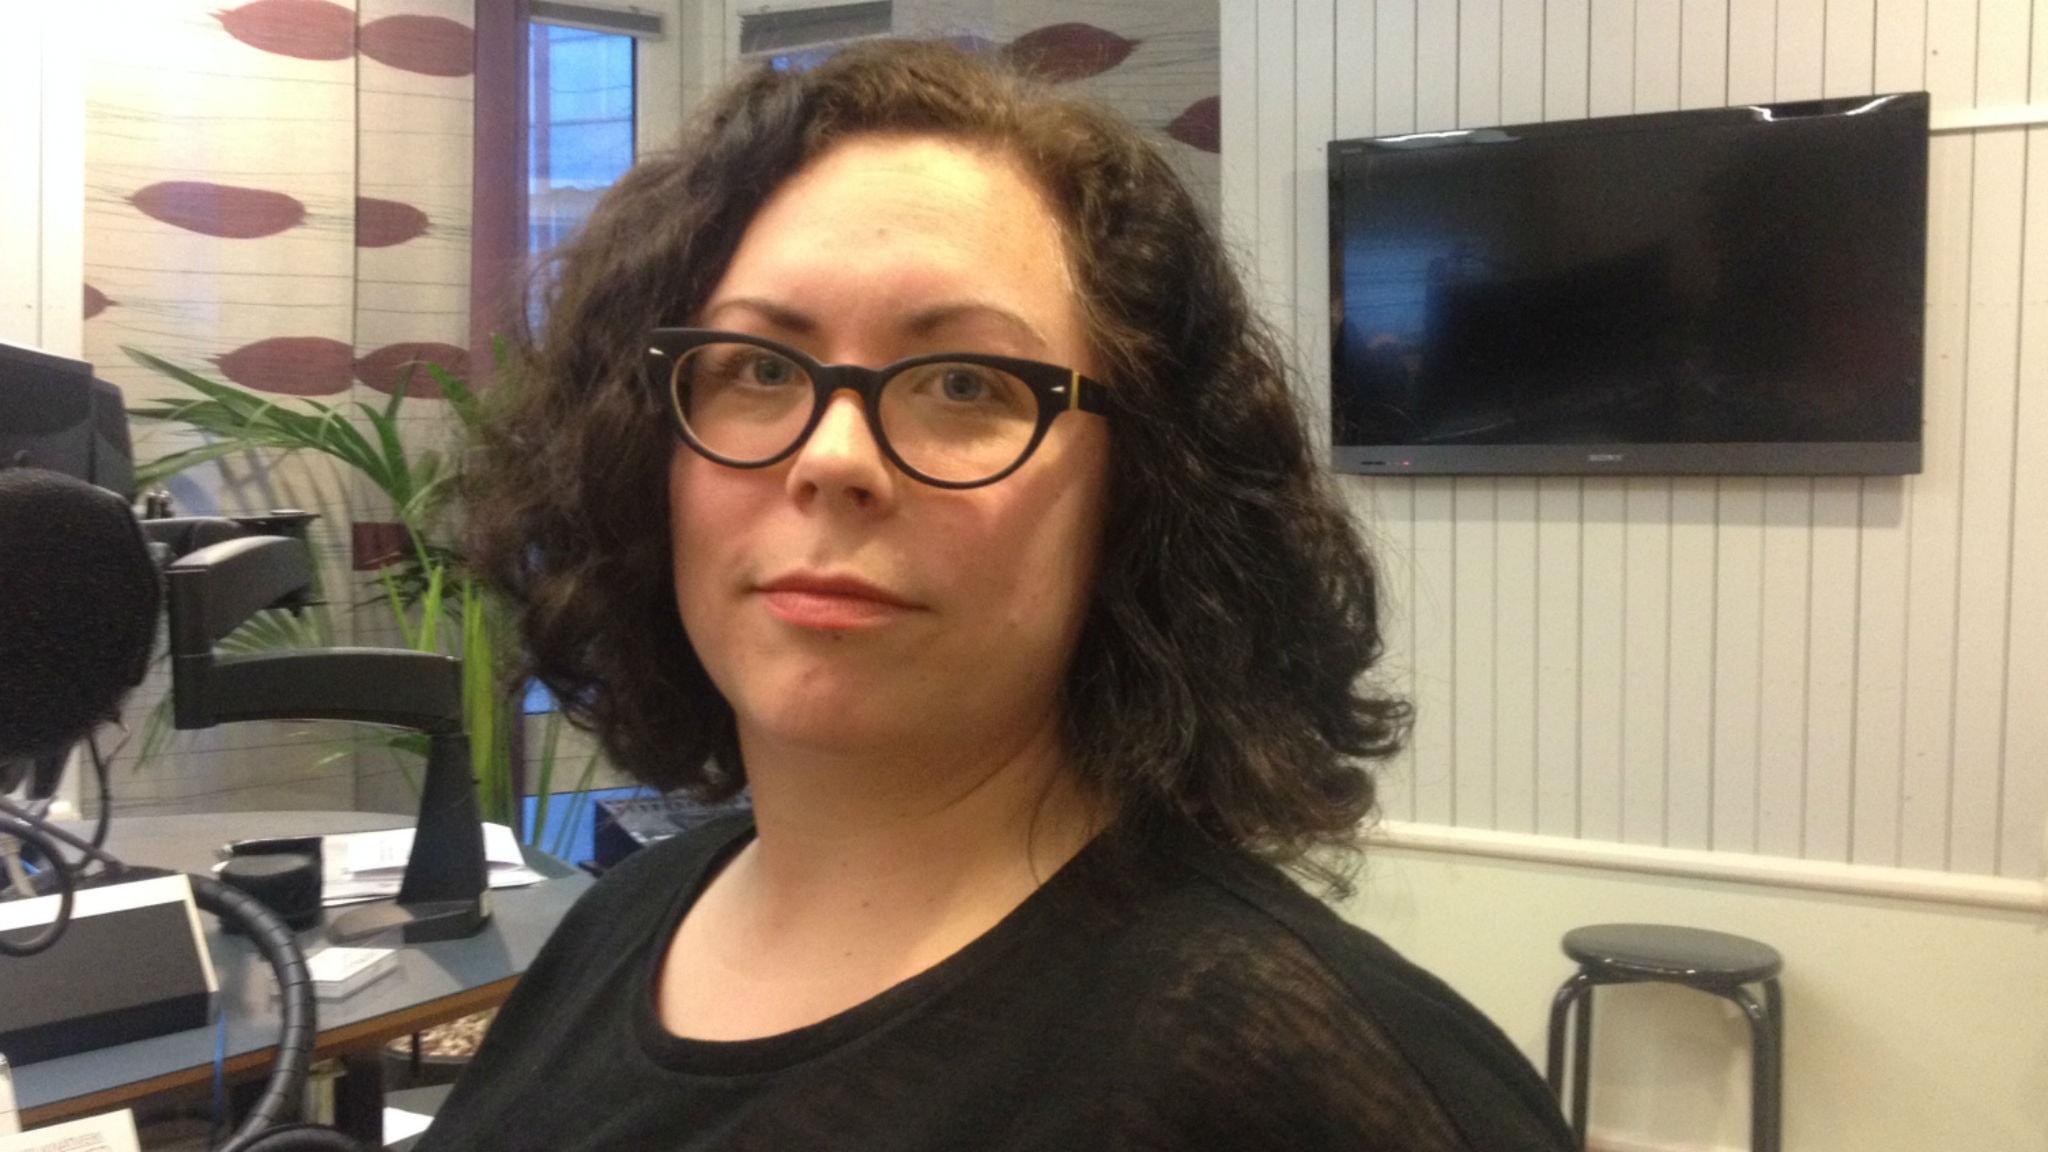 fri ledsagare avsugning nära Borås